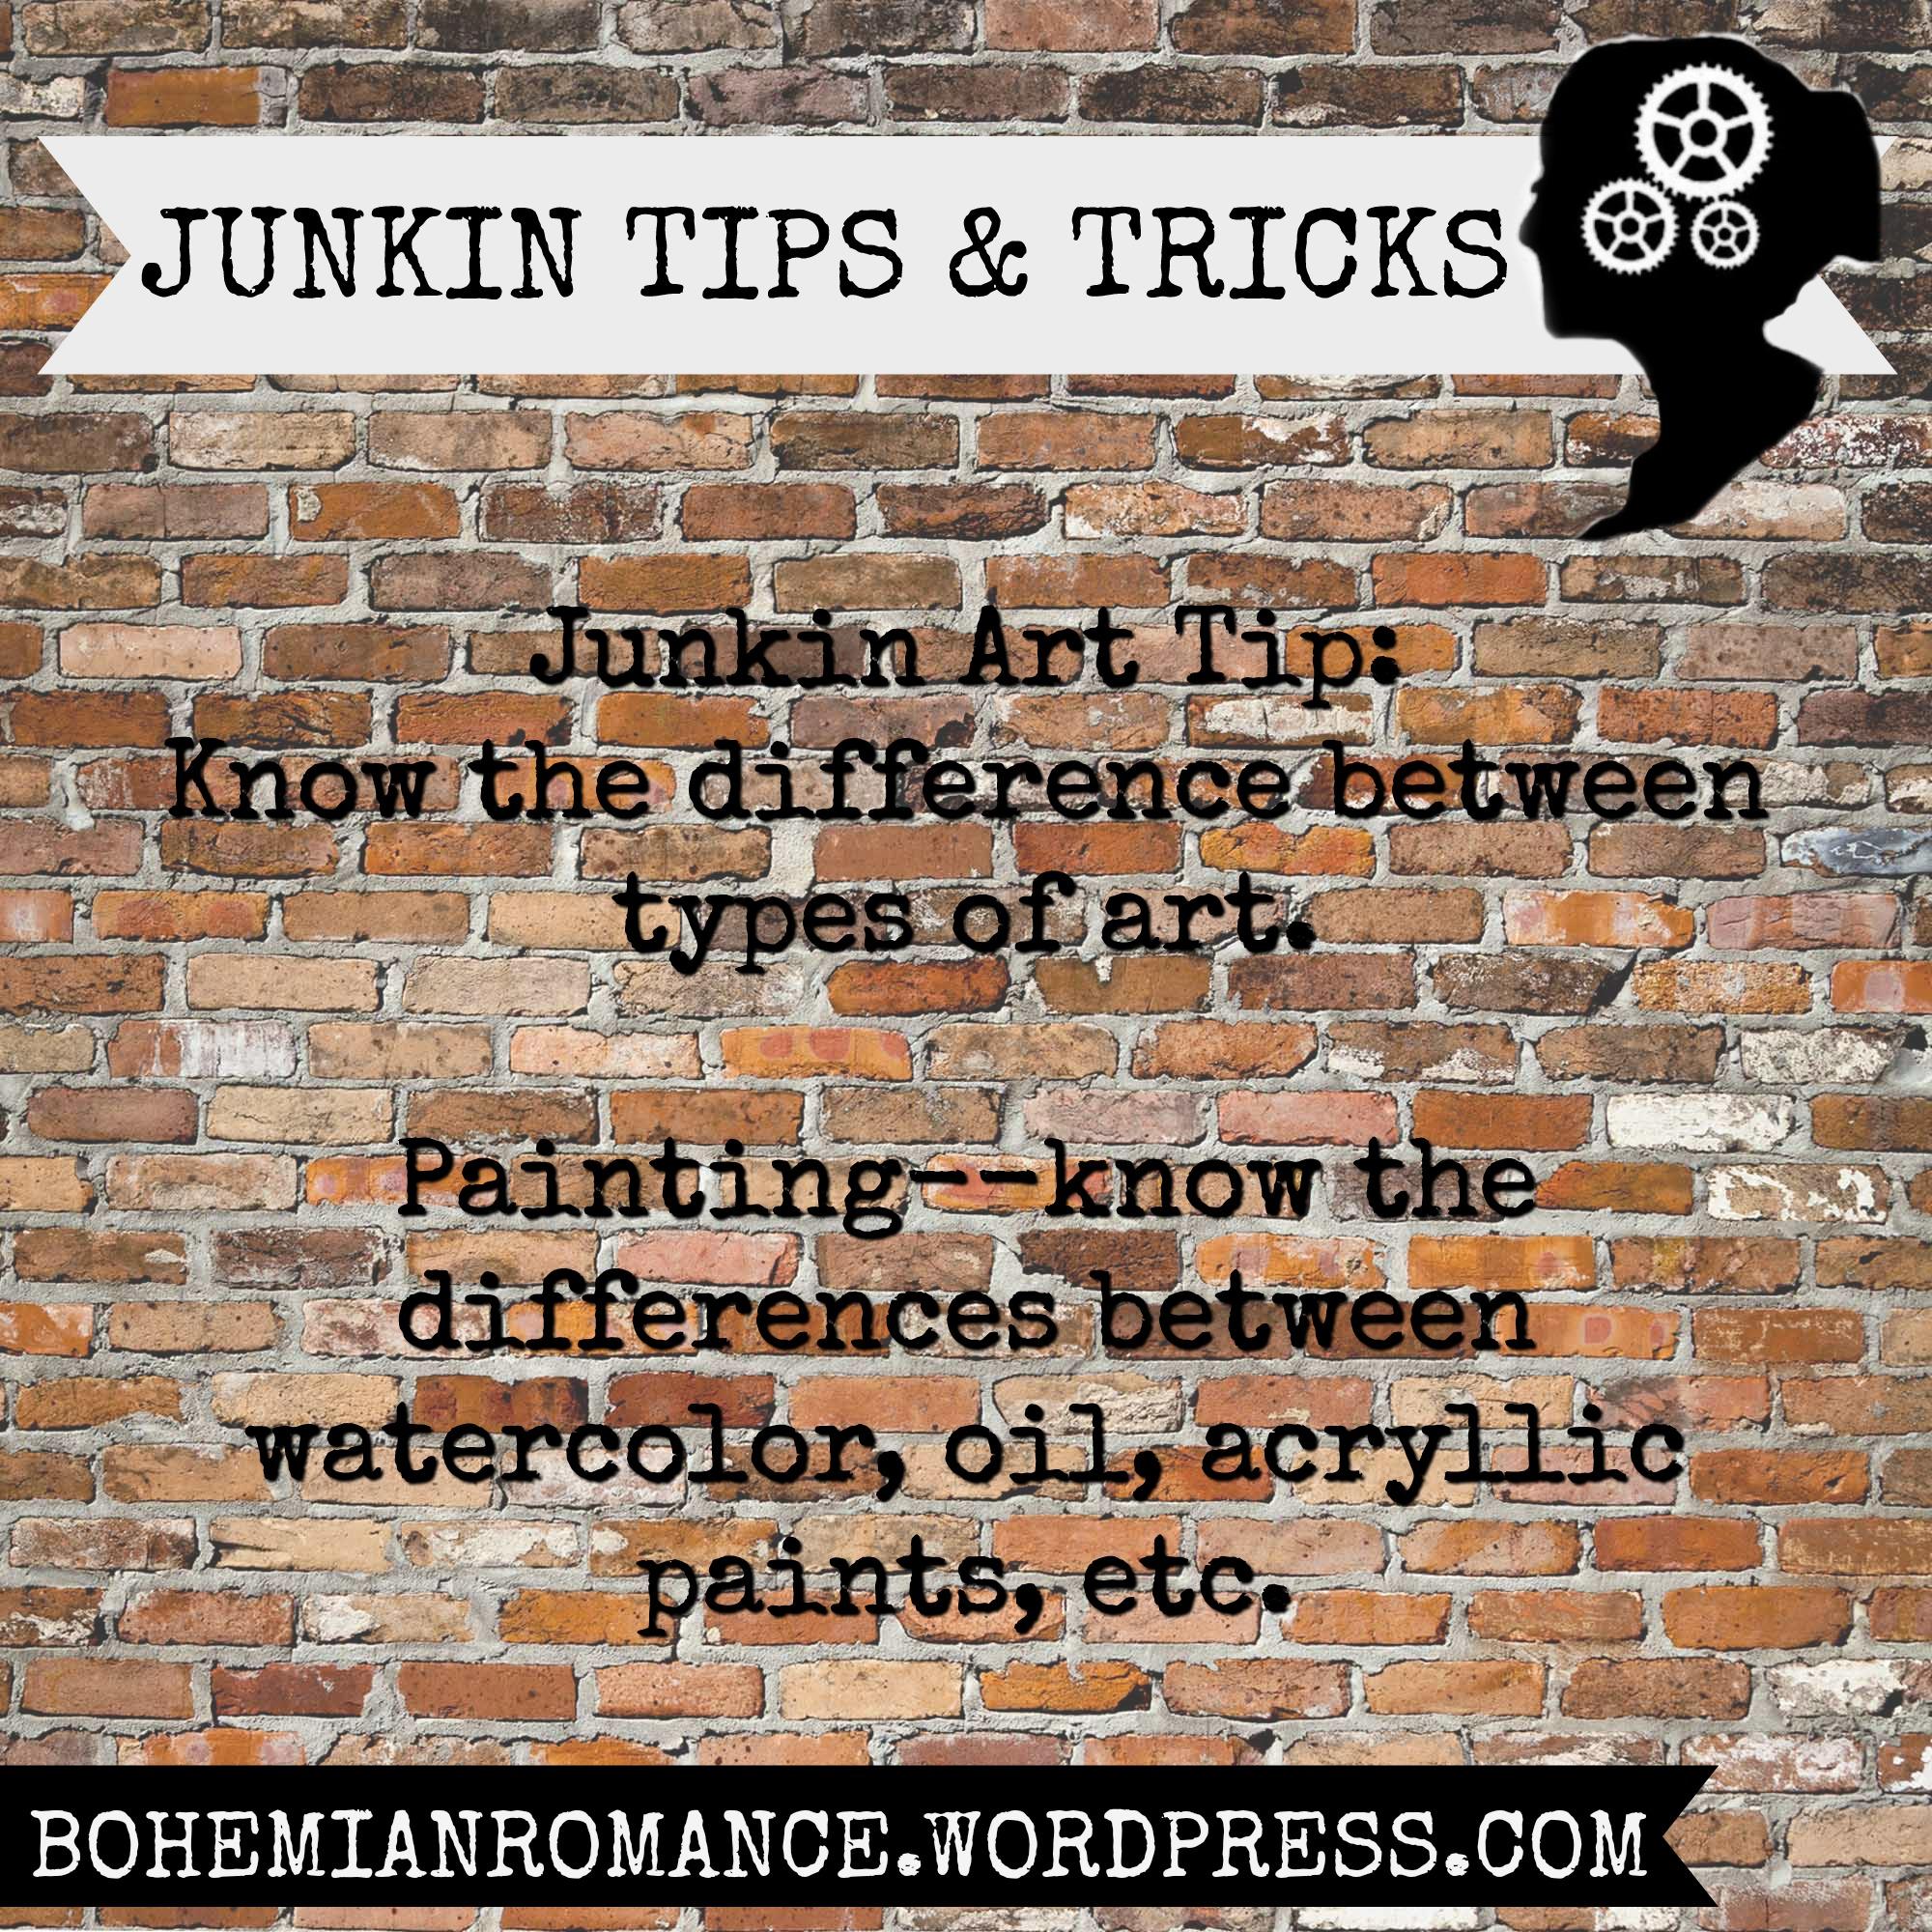 43-junkin-tips-tricks-template